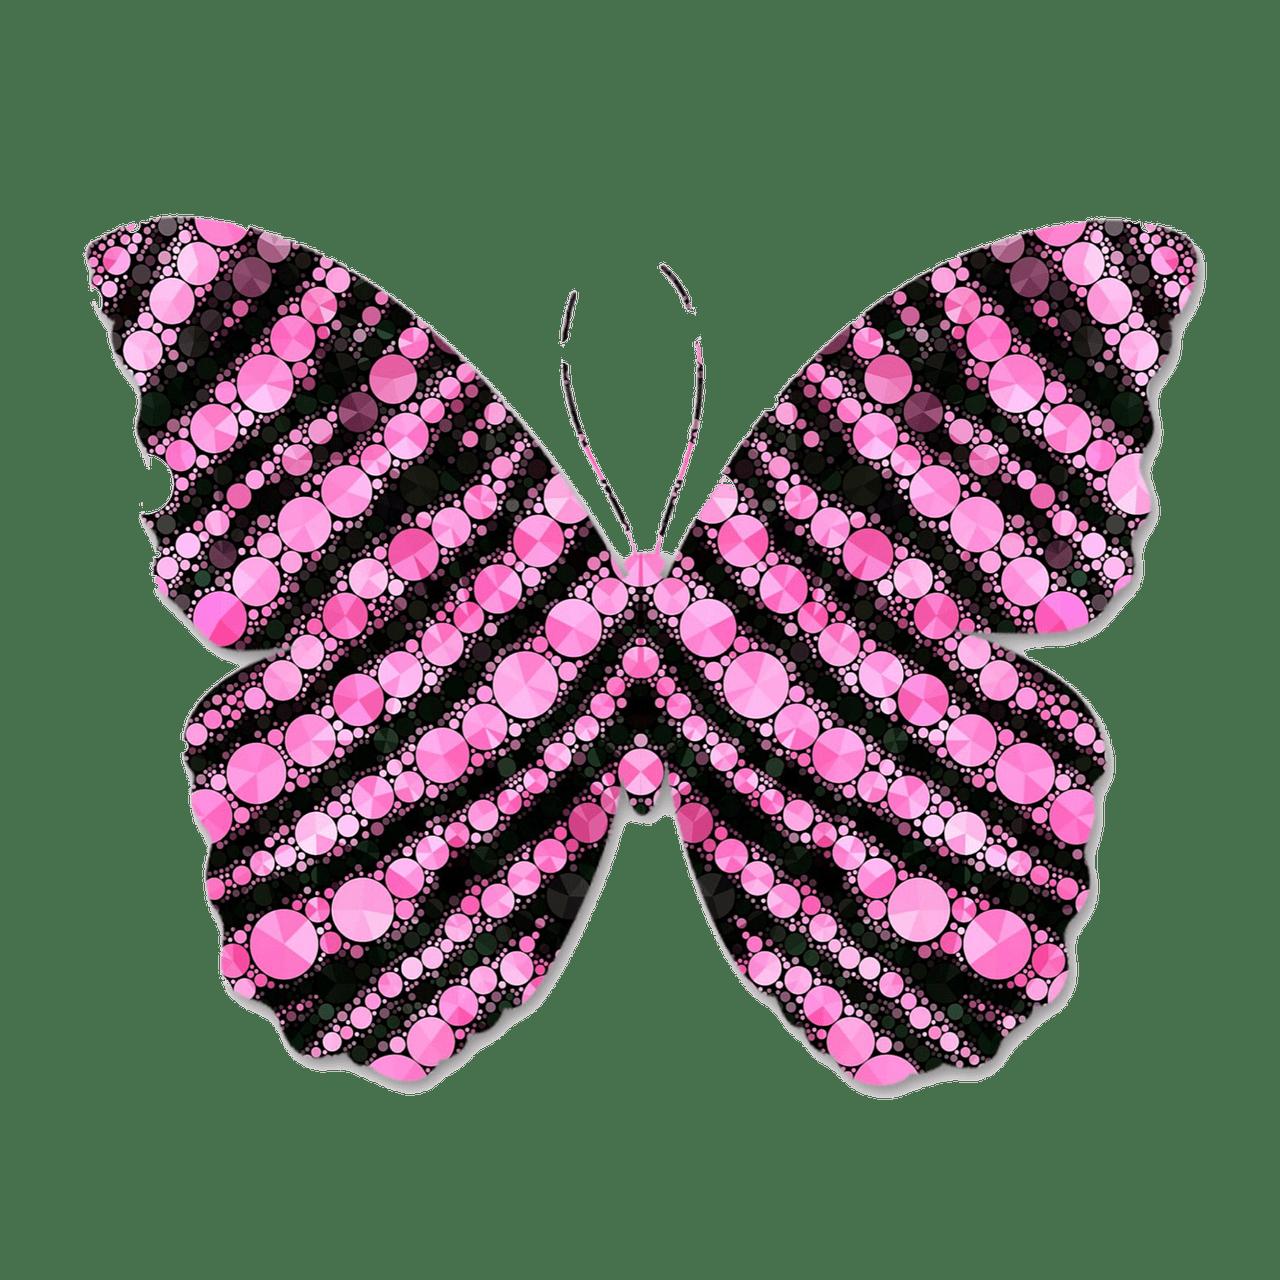 Moth clipart transparent. Pink and black circles